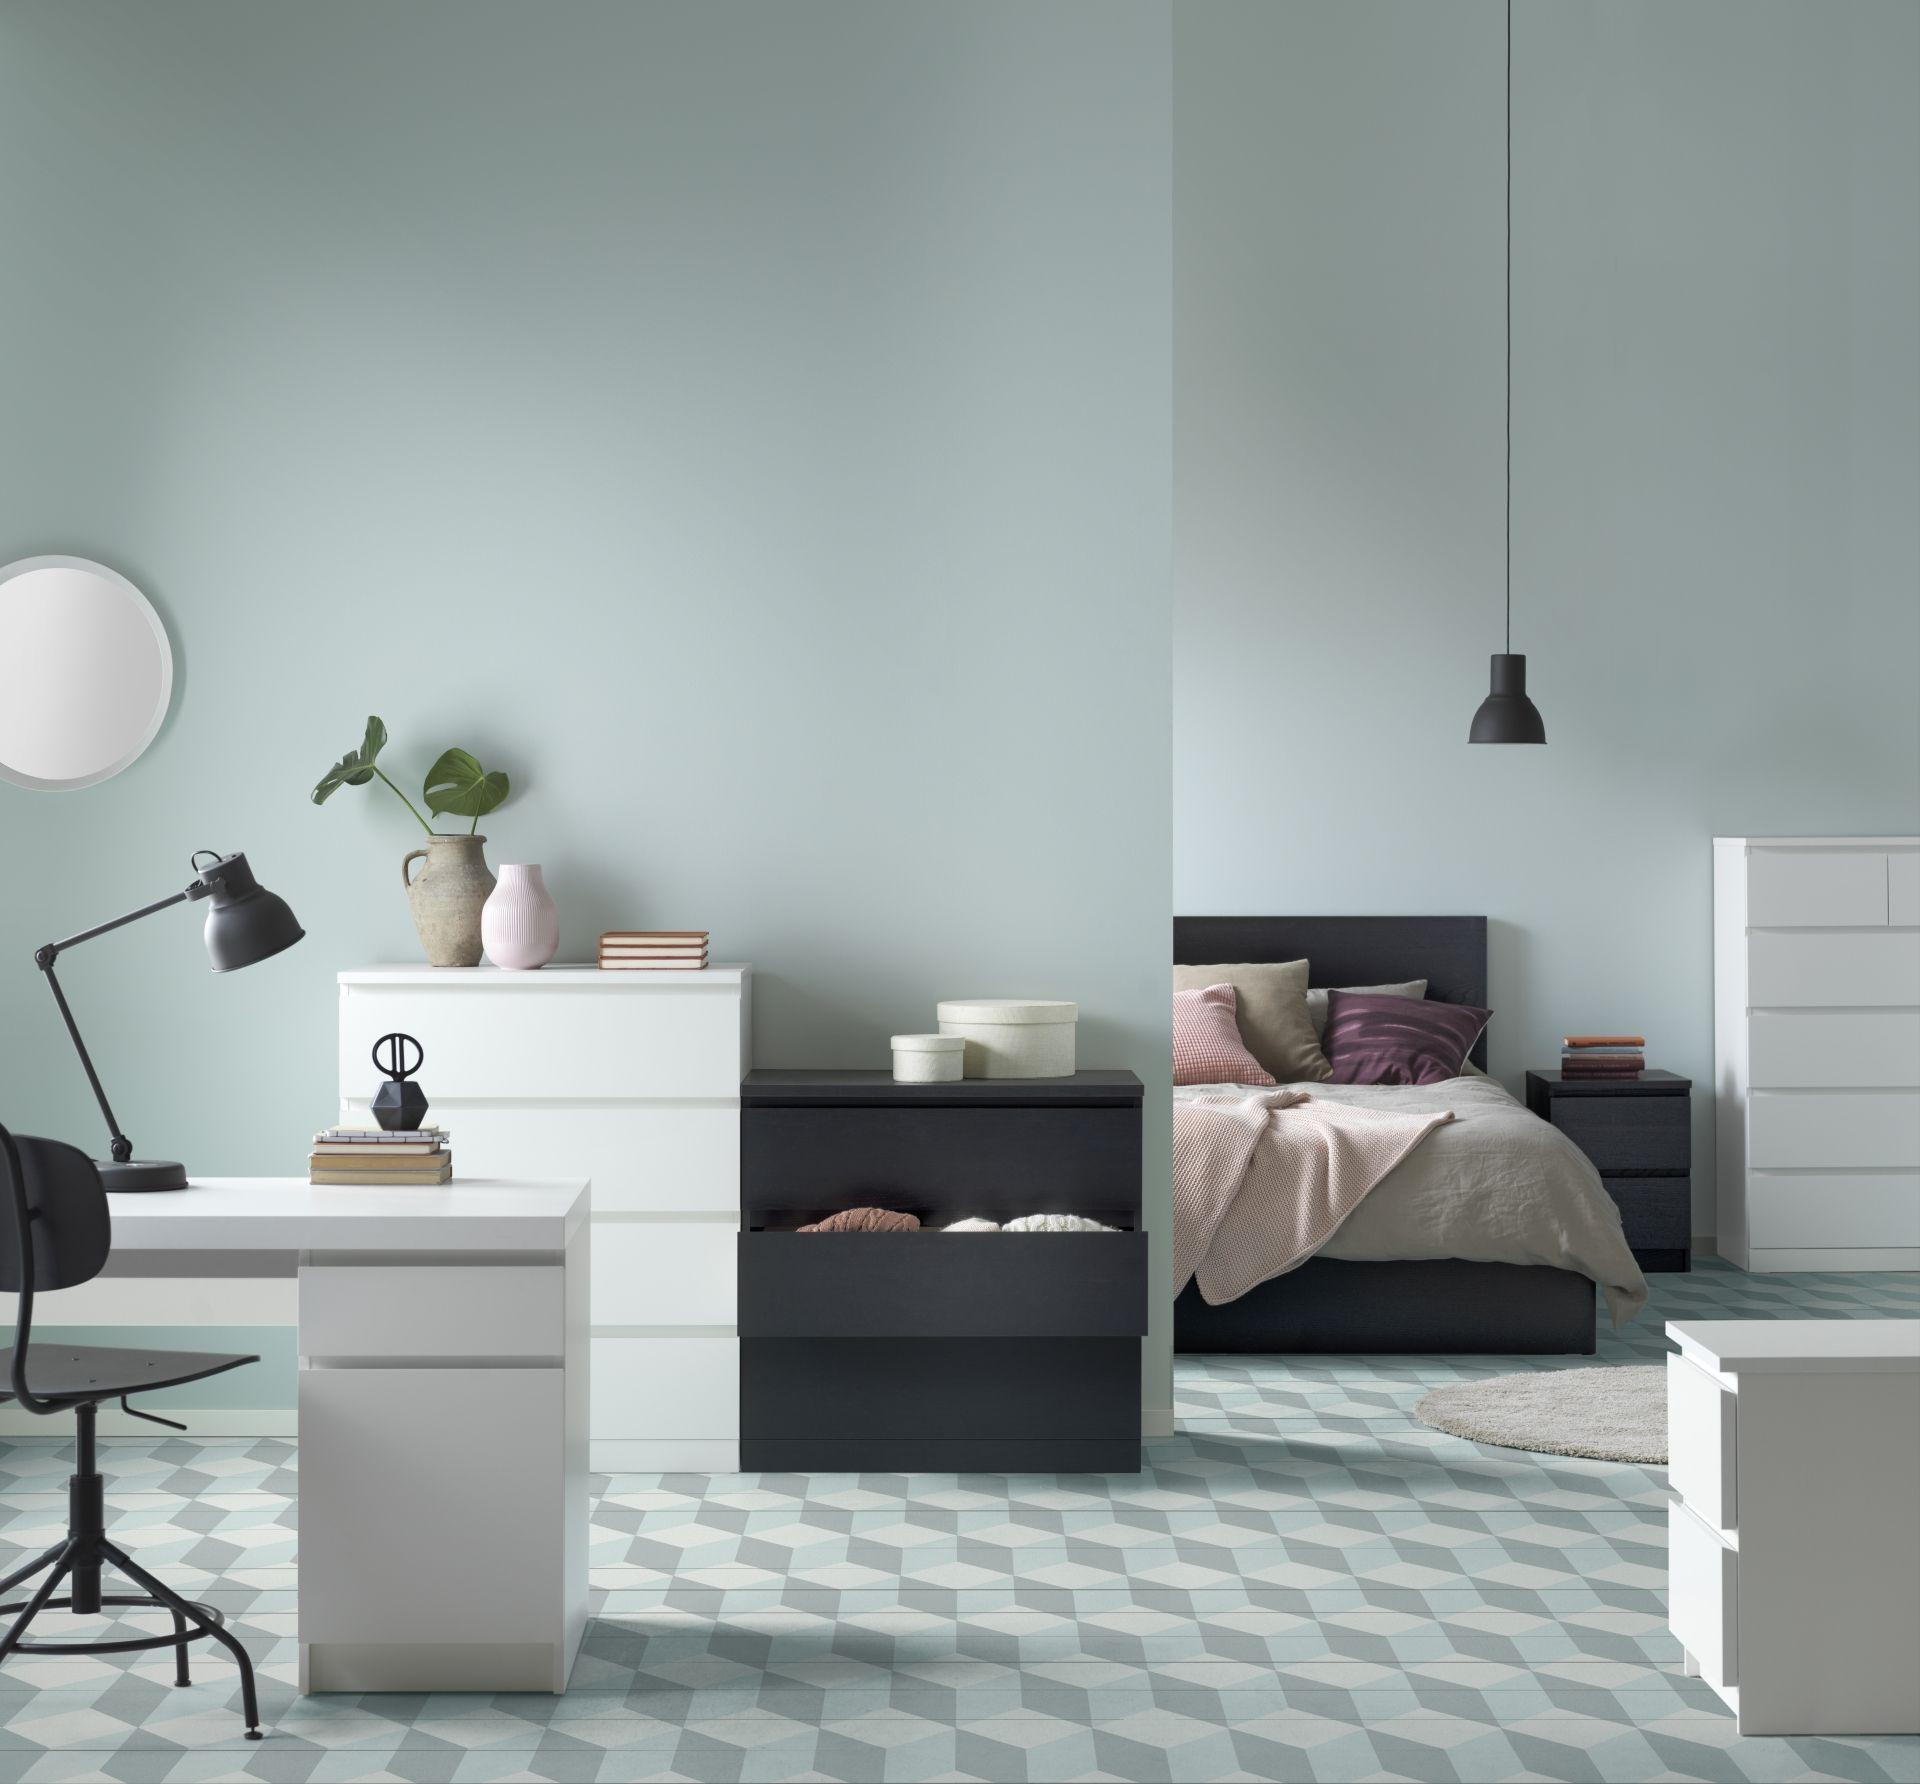 MALM Ladekast 3 lades, wit | Babette | Designdroom | Pinterest ...